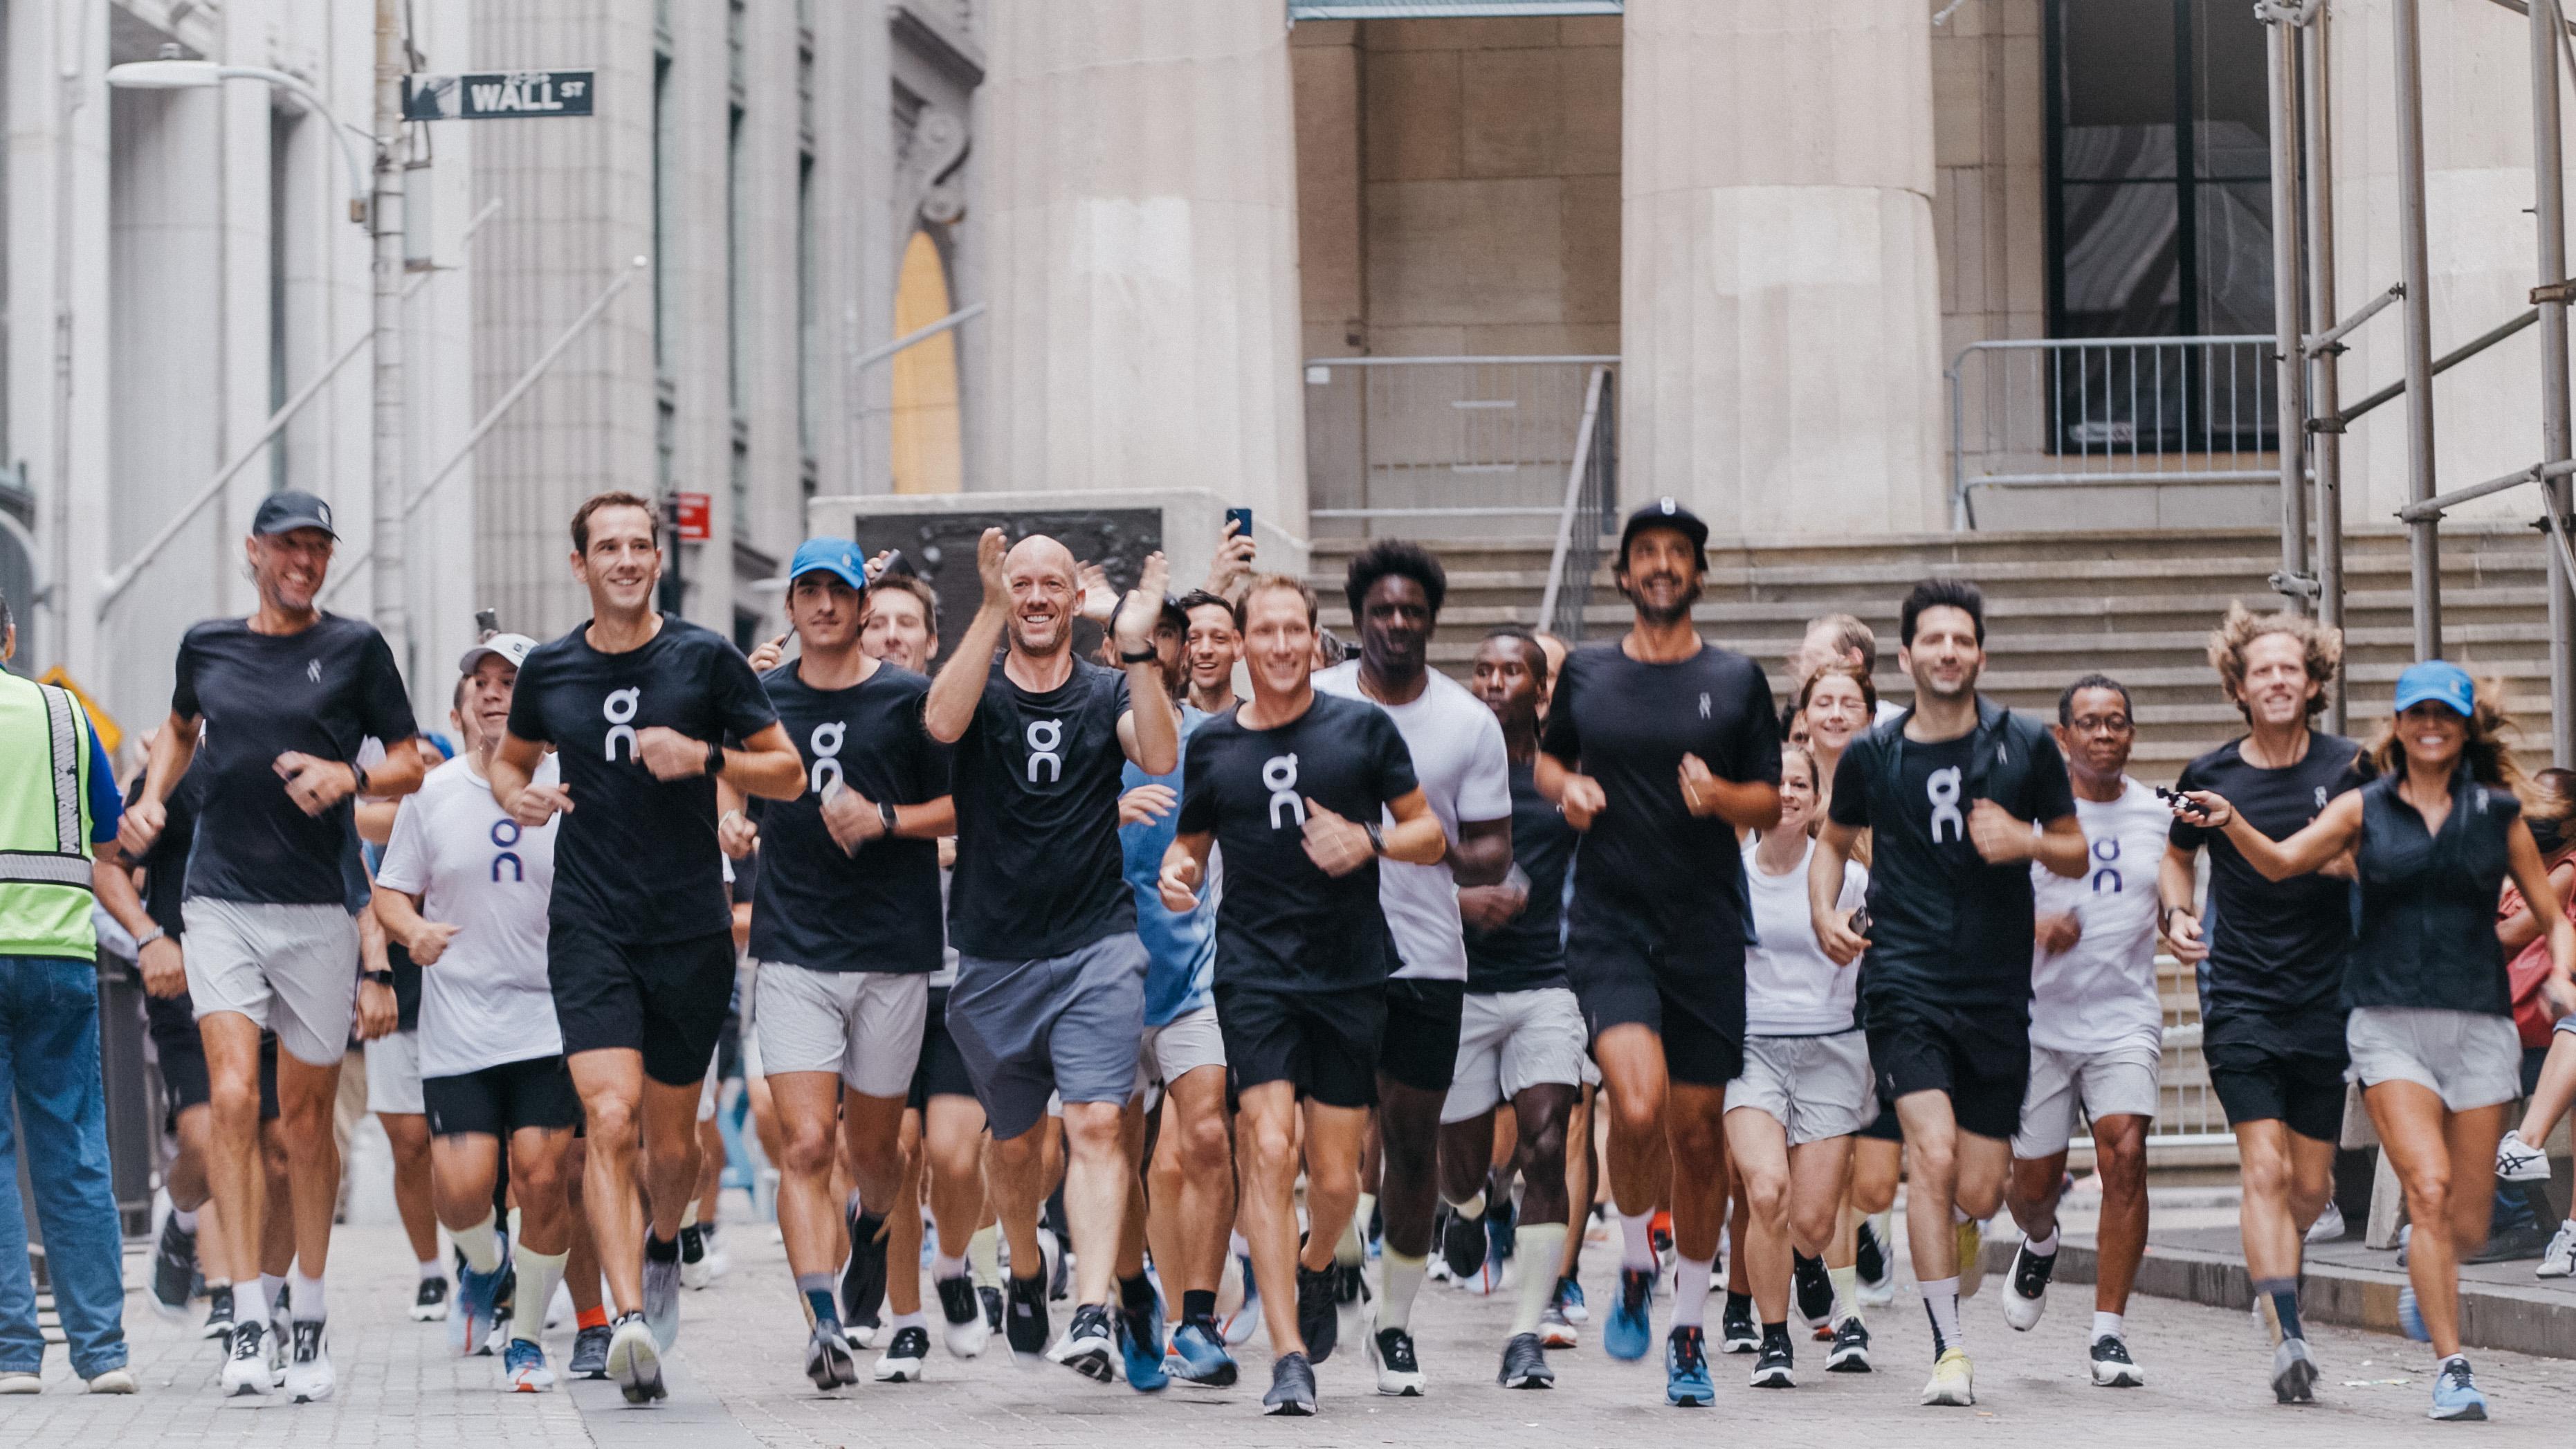 NYSE on Running editorials